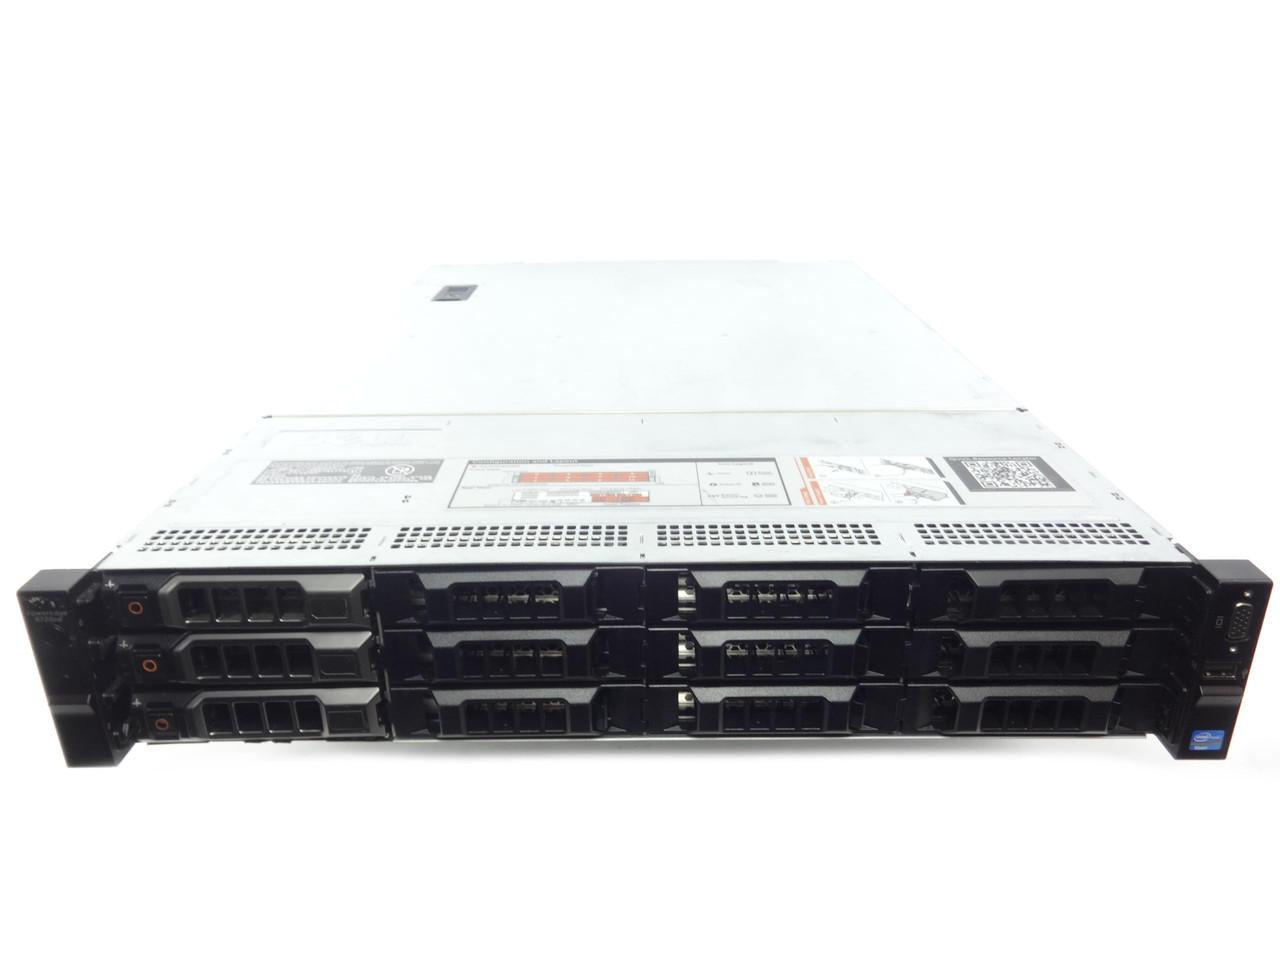 Poweredge R720XD LFF Server